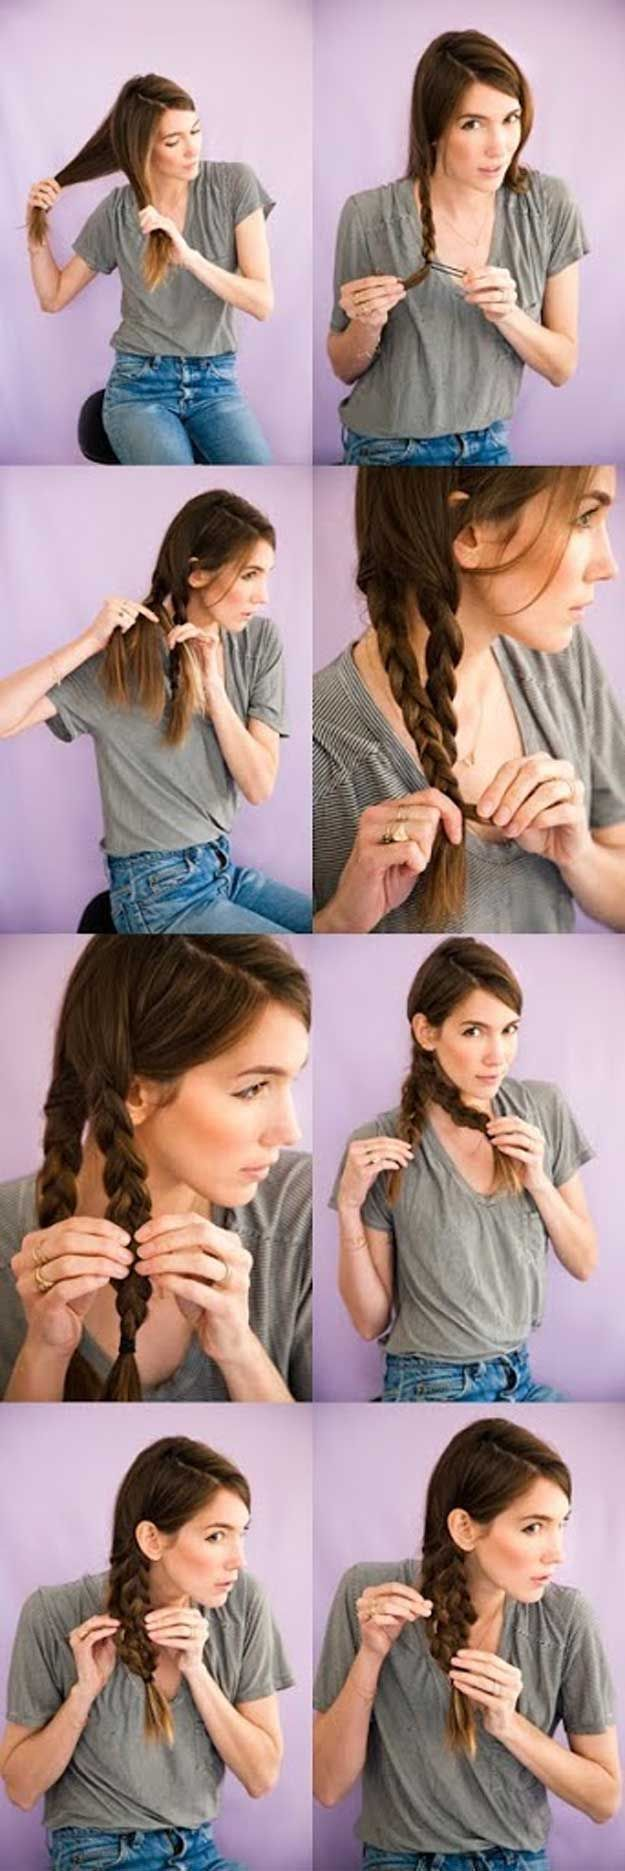 5 Minute Hairstyle - Wet Braids | Medium hair styles ...